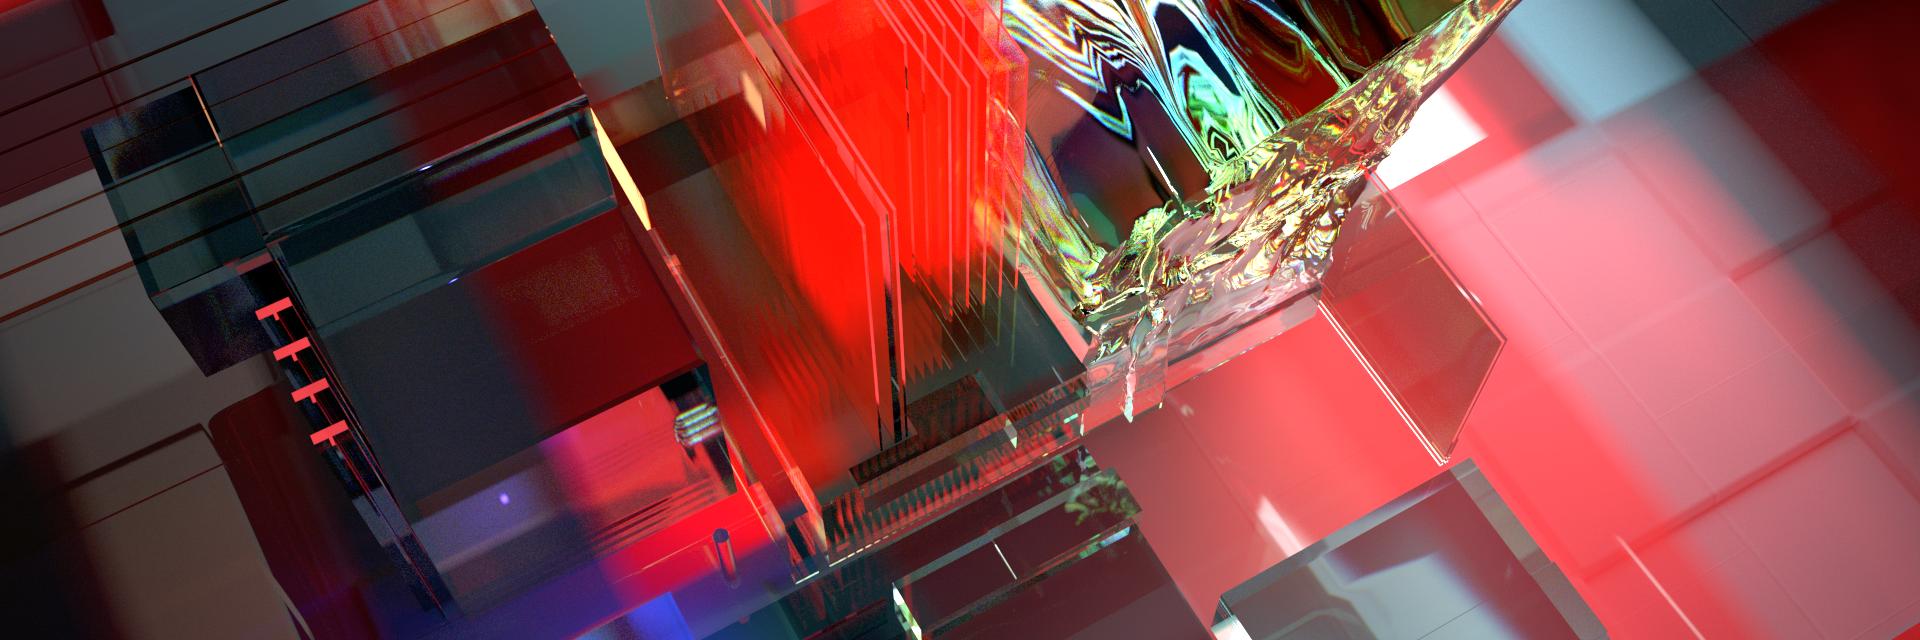 AdobeMax_2019_1920x640_0004_motherboard_1